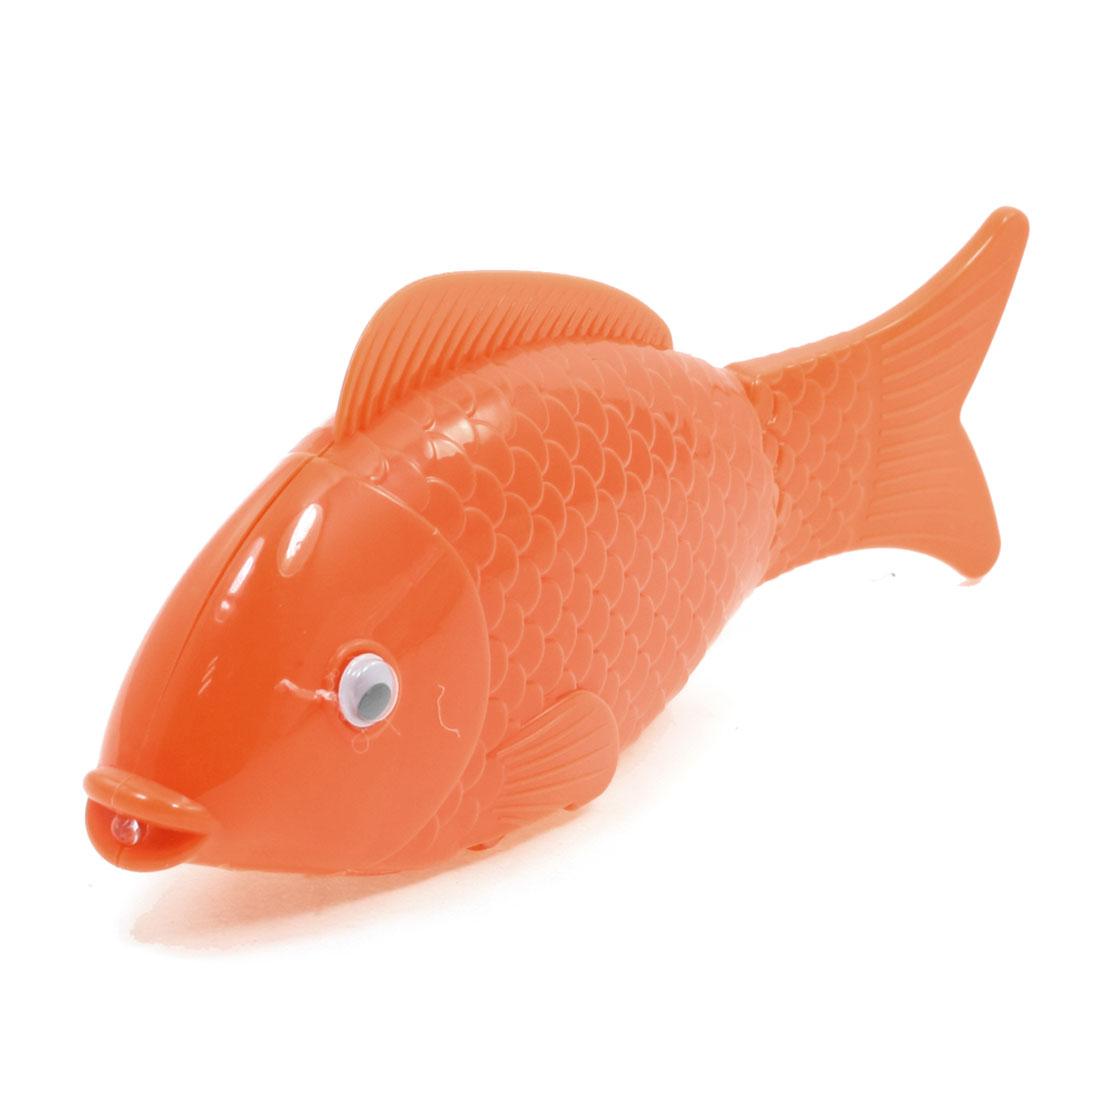 Kids Gift Orange Plastic Body Three Wheels Walking Music Fish Toy